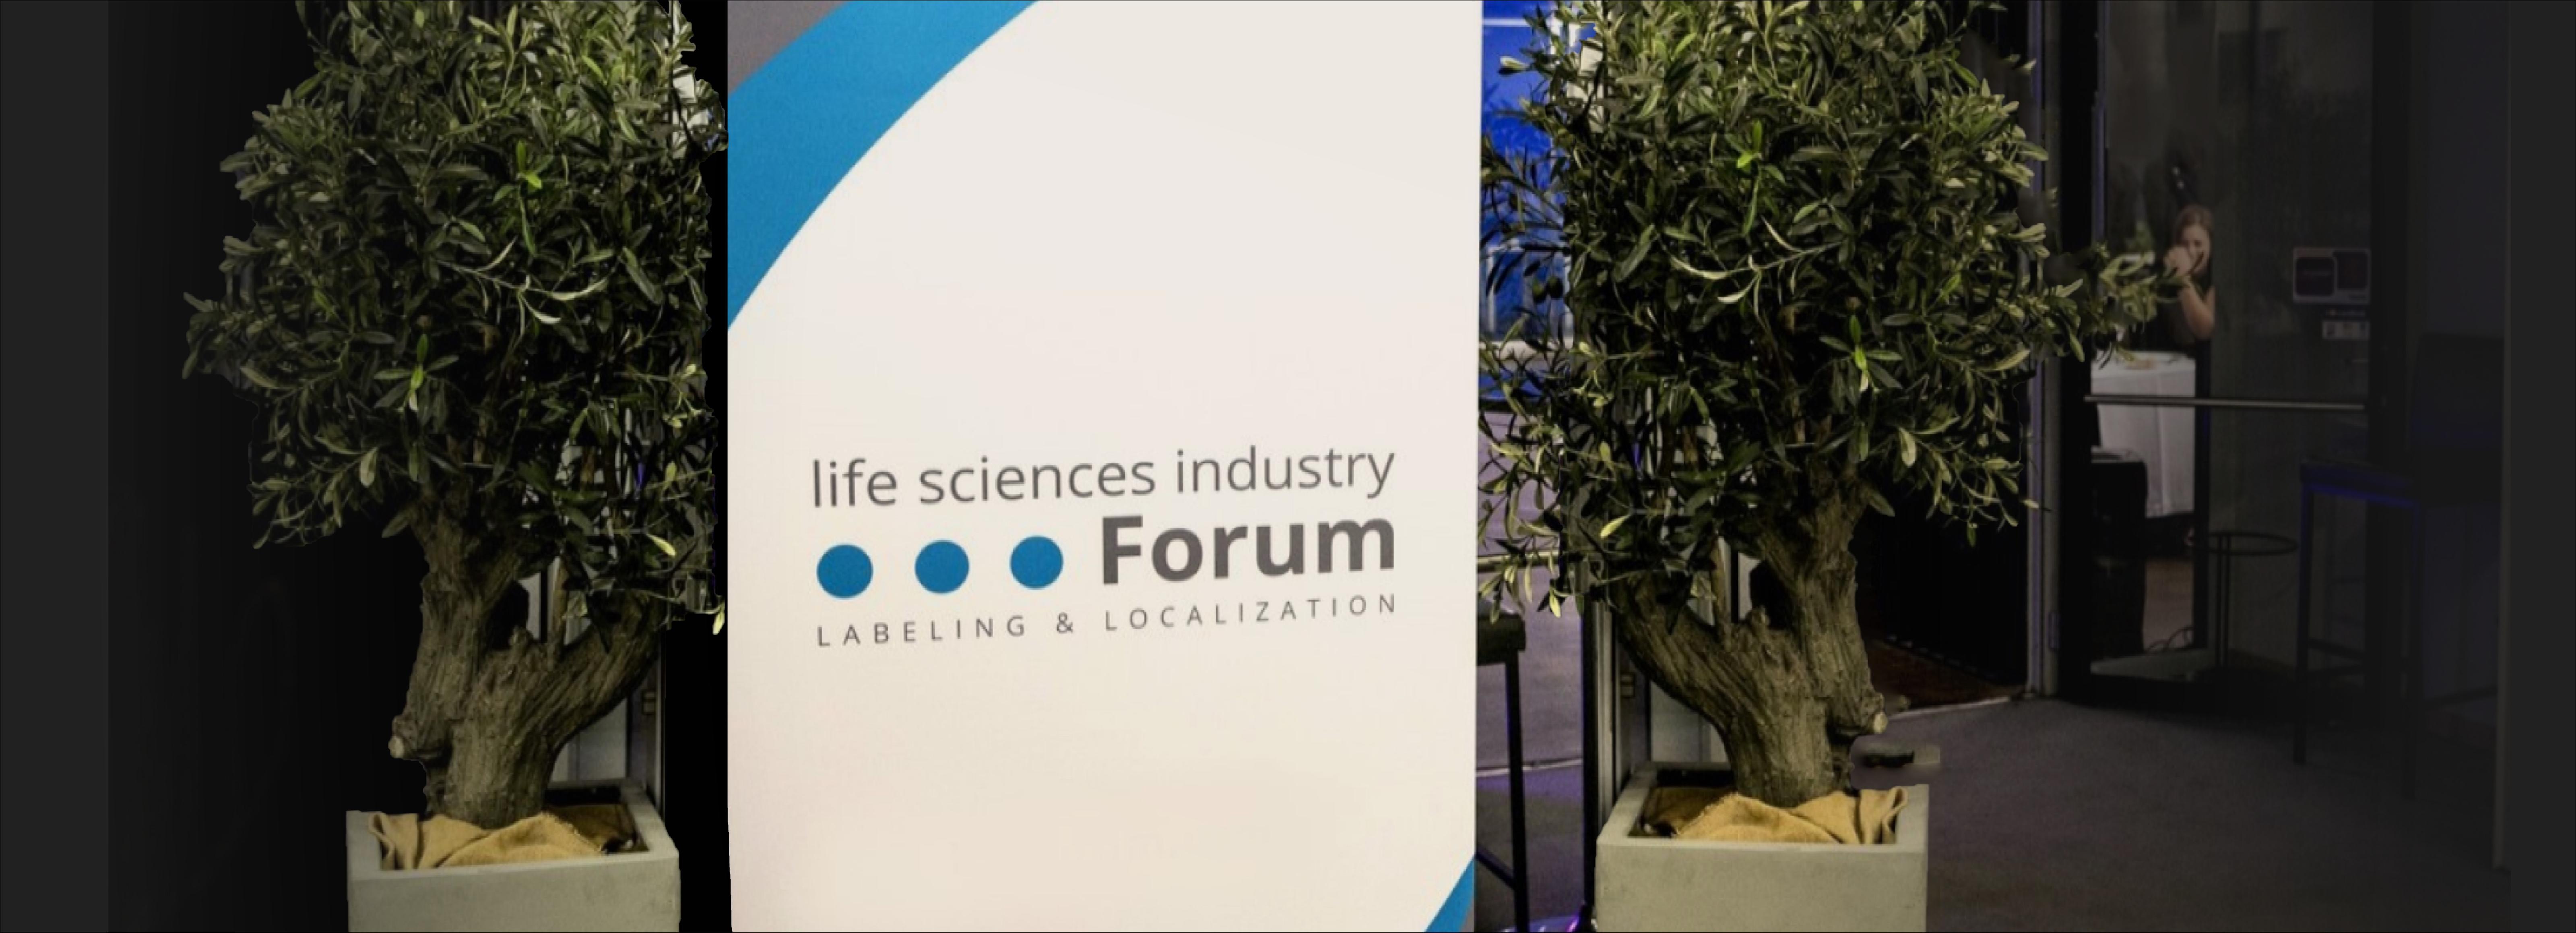 LSIForum Workshop 2019 events